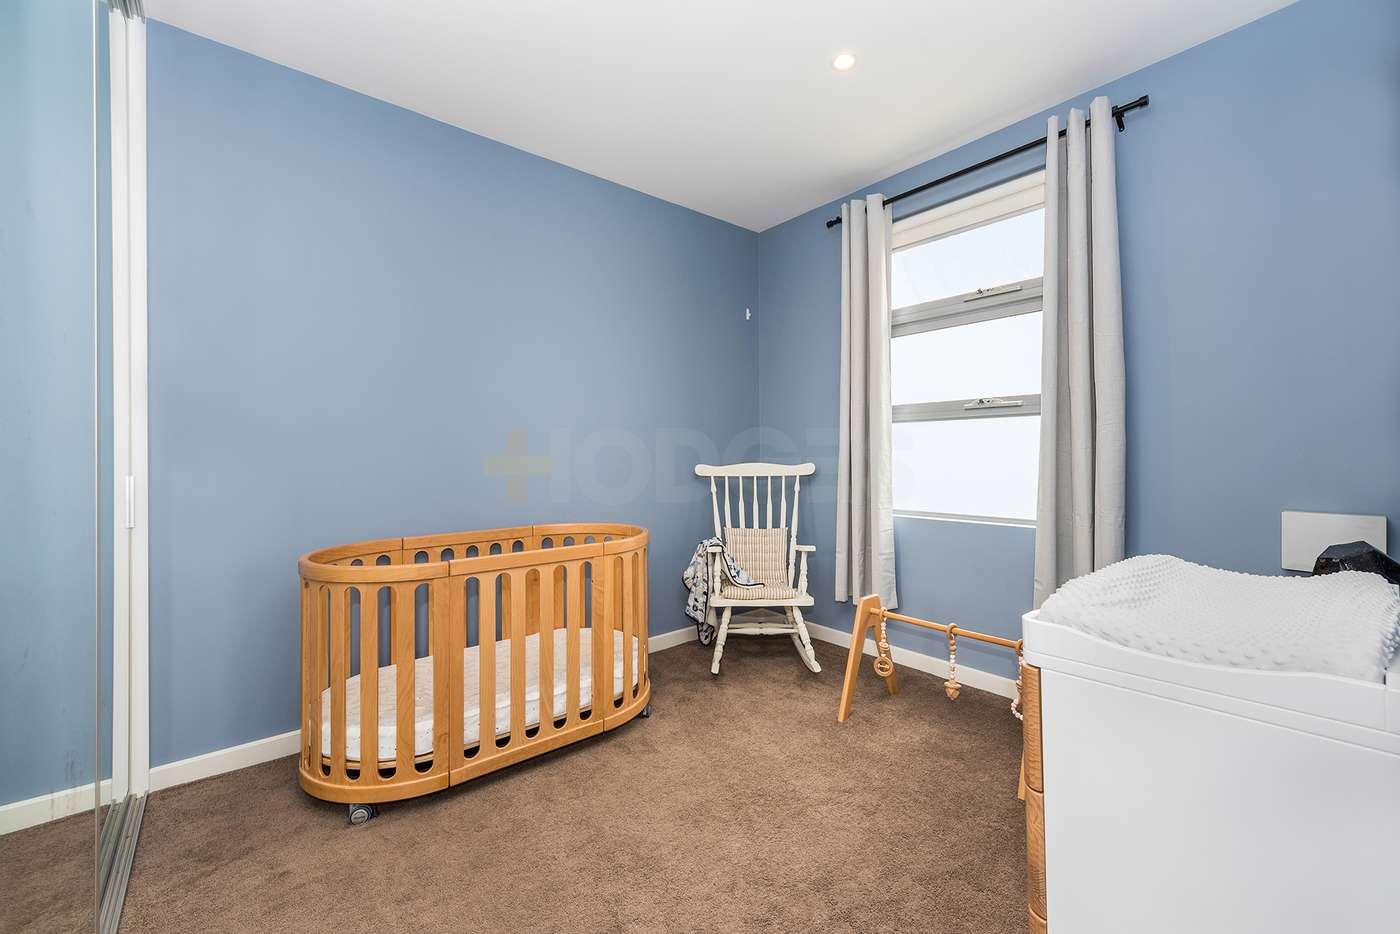 Sixth view of Homely townhouse listing, 8/30 Sydenham  Street, Seddon VIC 3011